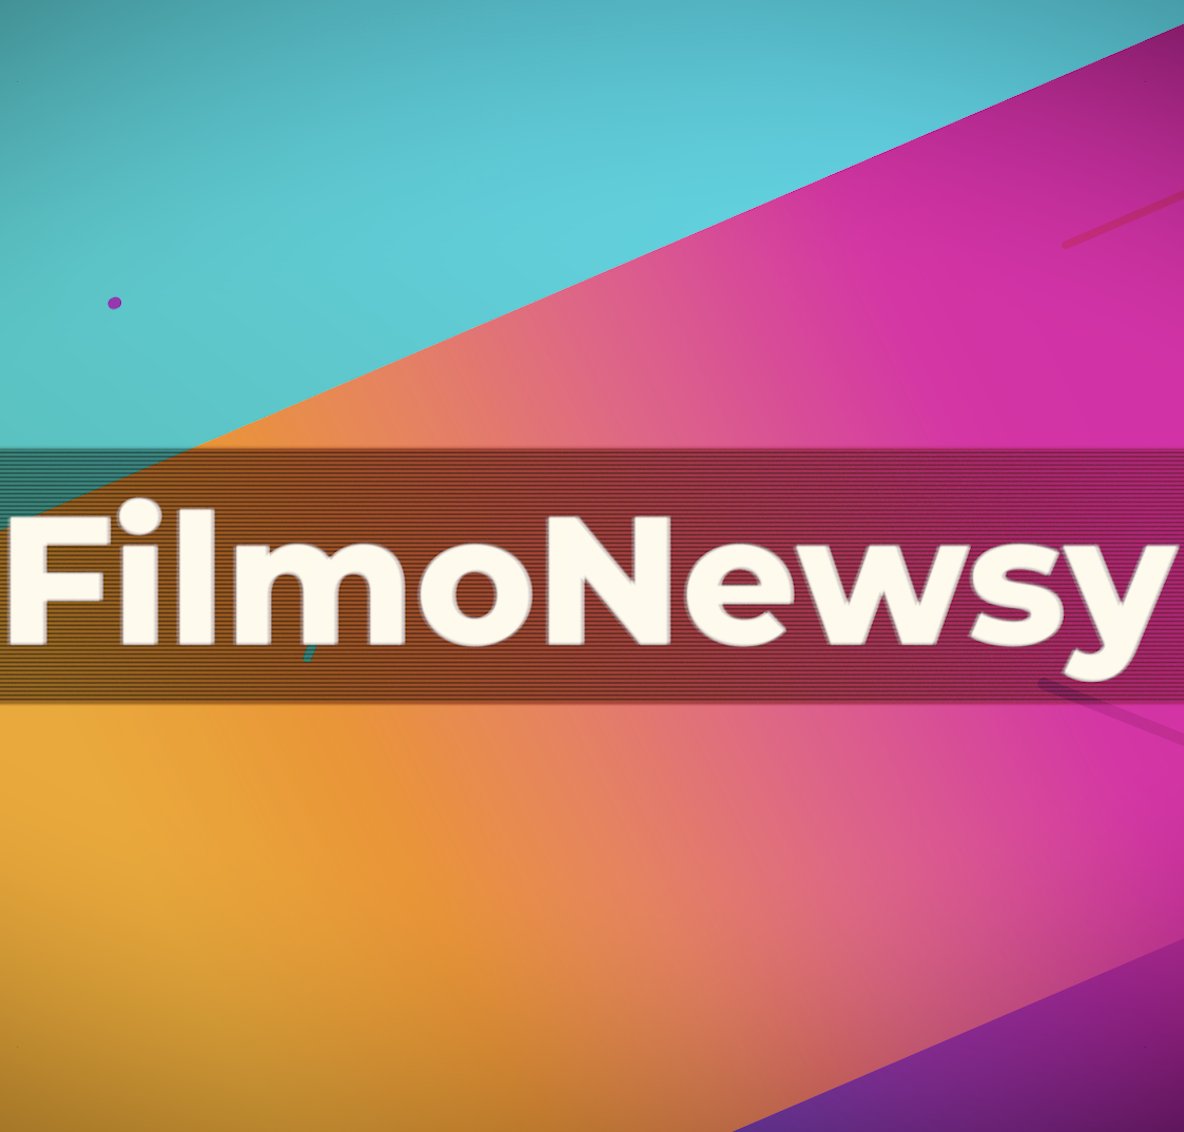 FilmoNewsy